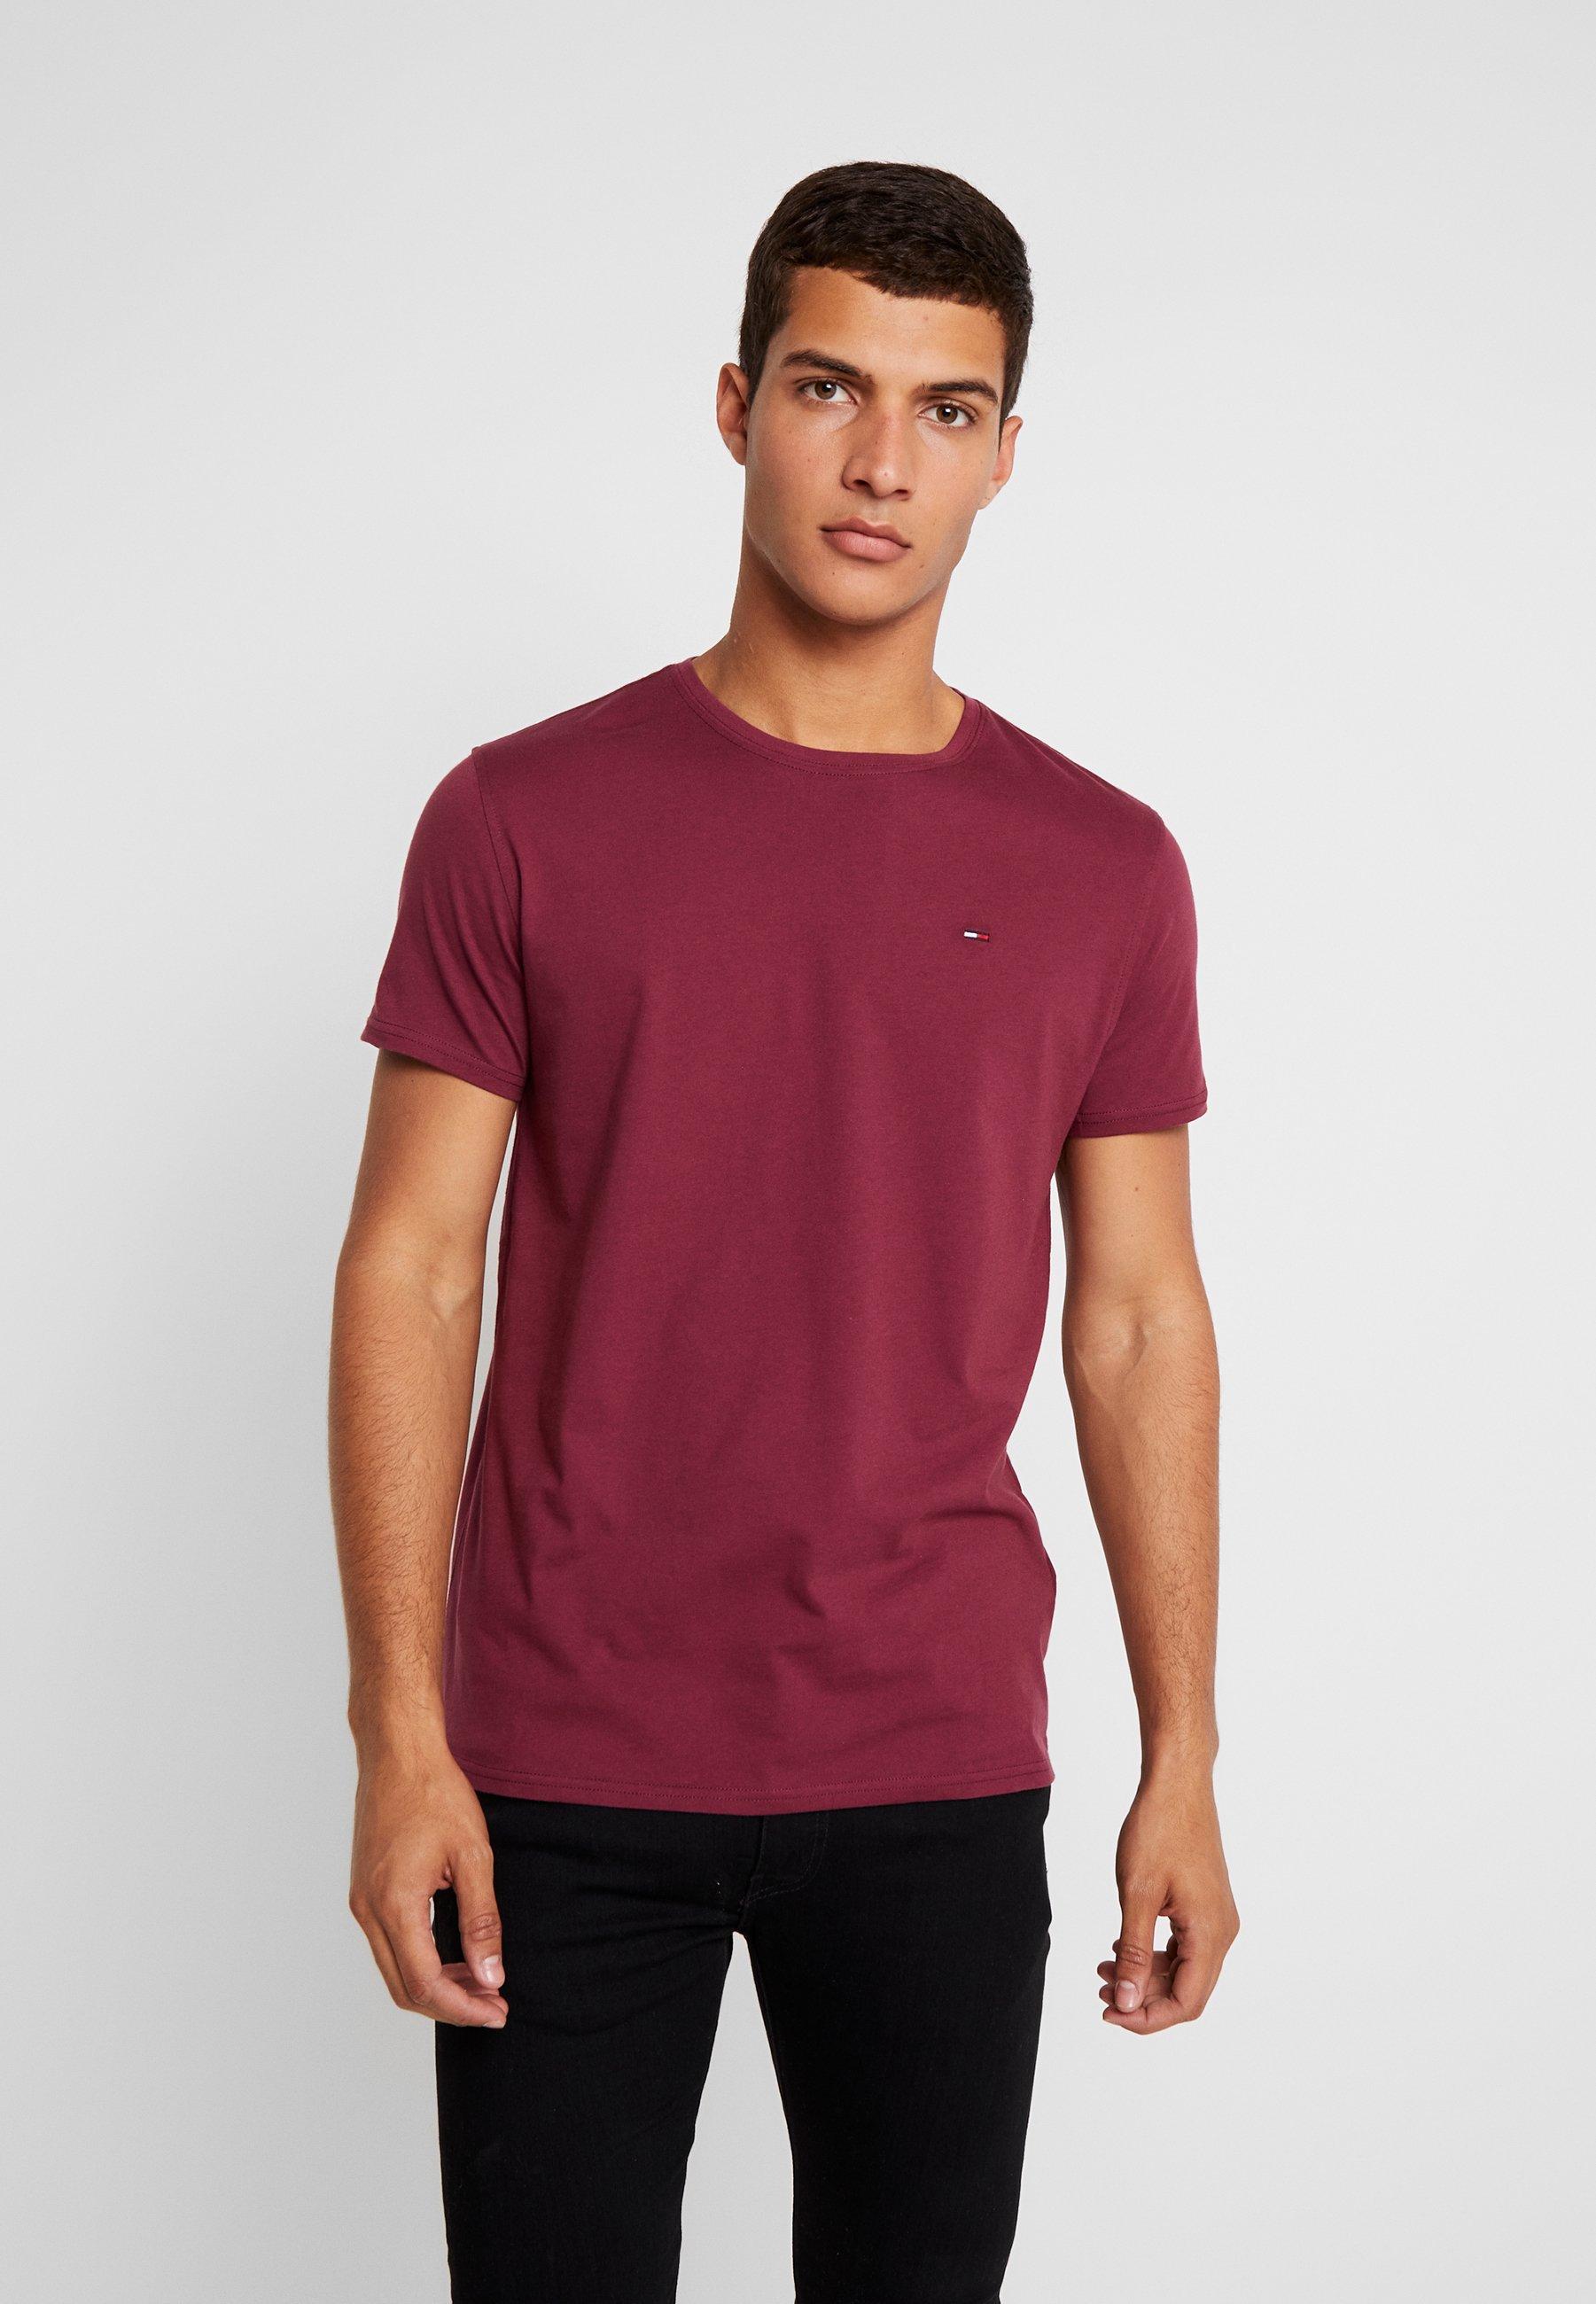 Basique Tommy shirt Burgundy Jeans TeeT Original Crew Fc1lKJ